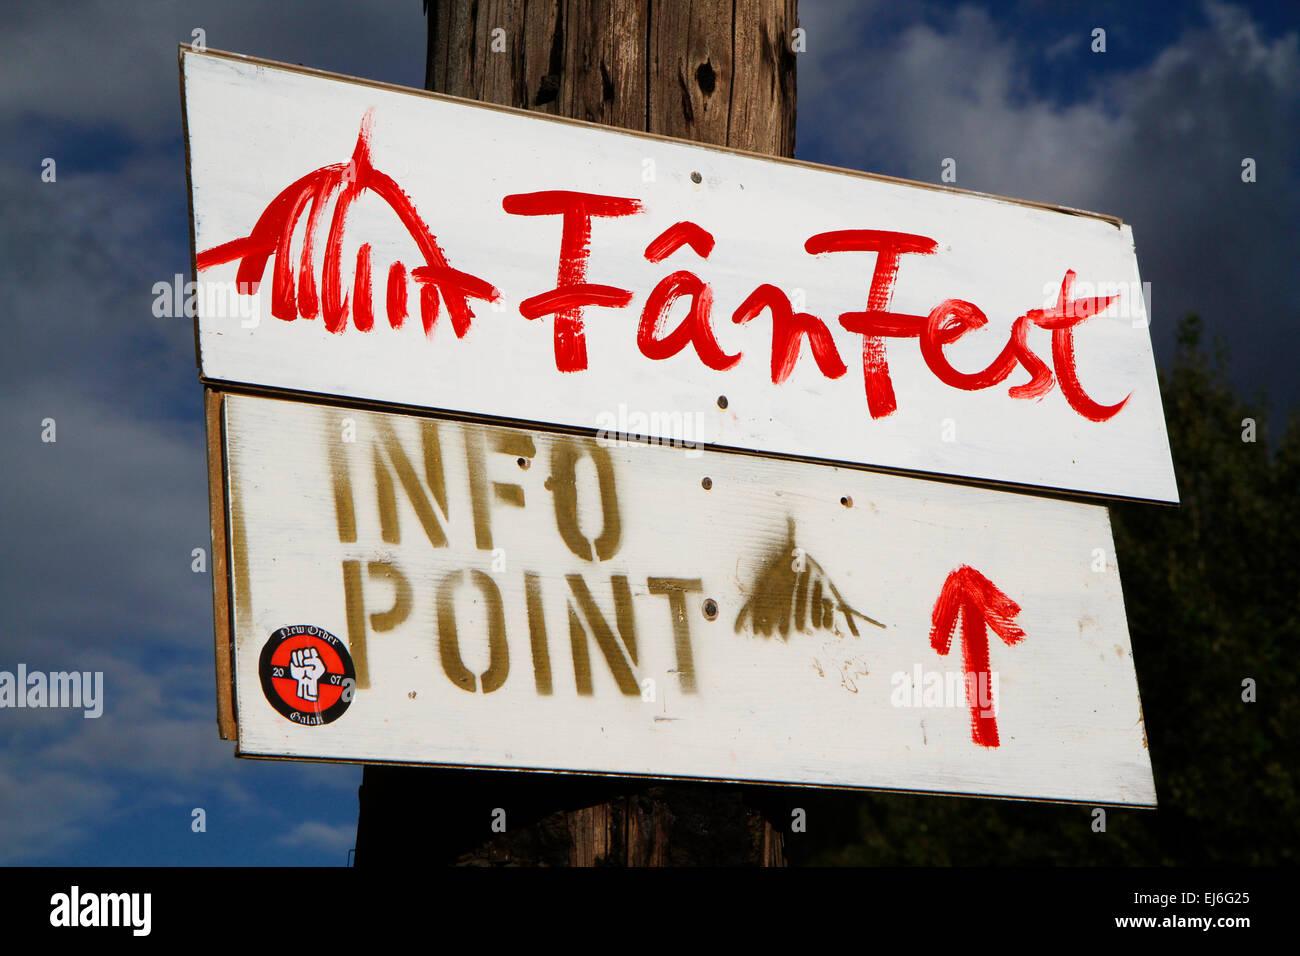 Fan Fest sign at Rosia Montana, Romania - Stock Image